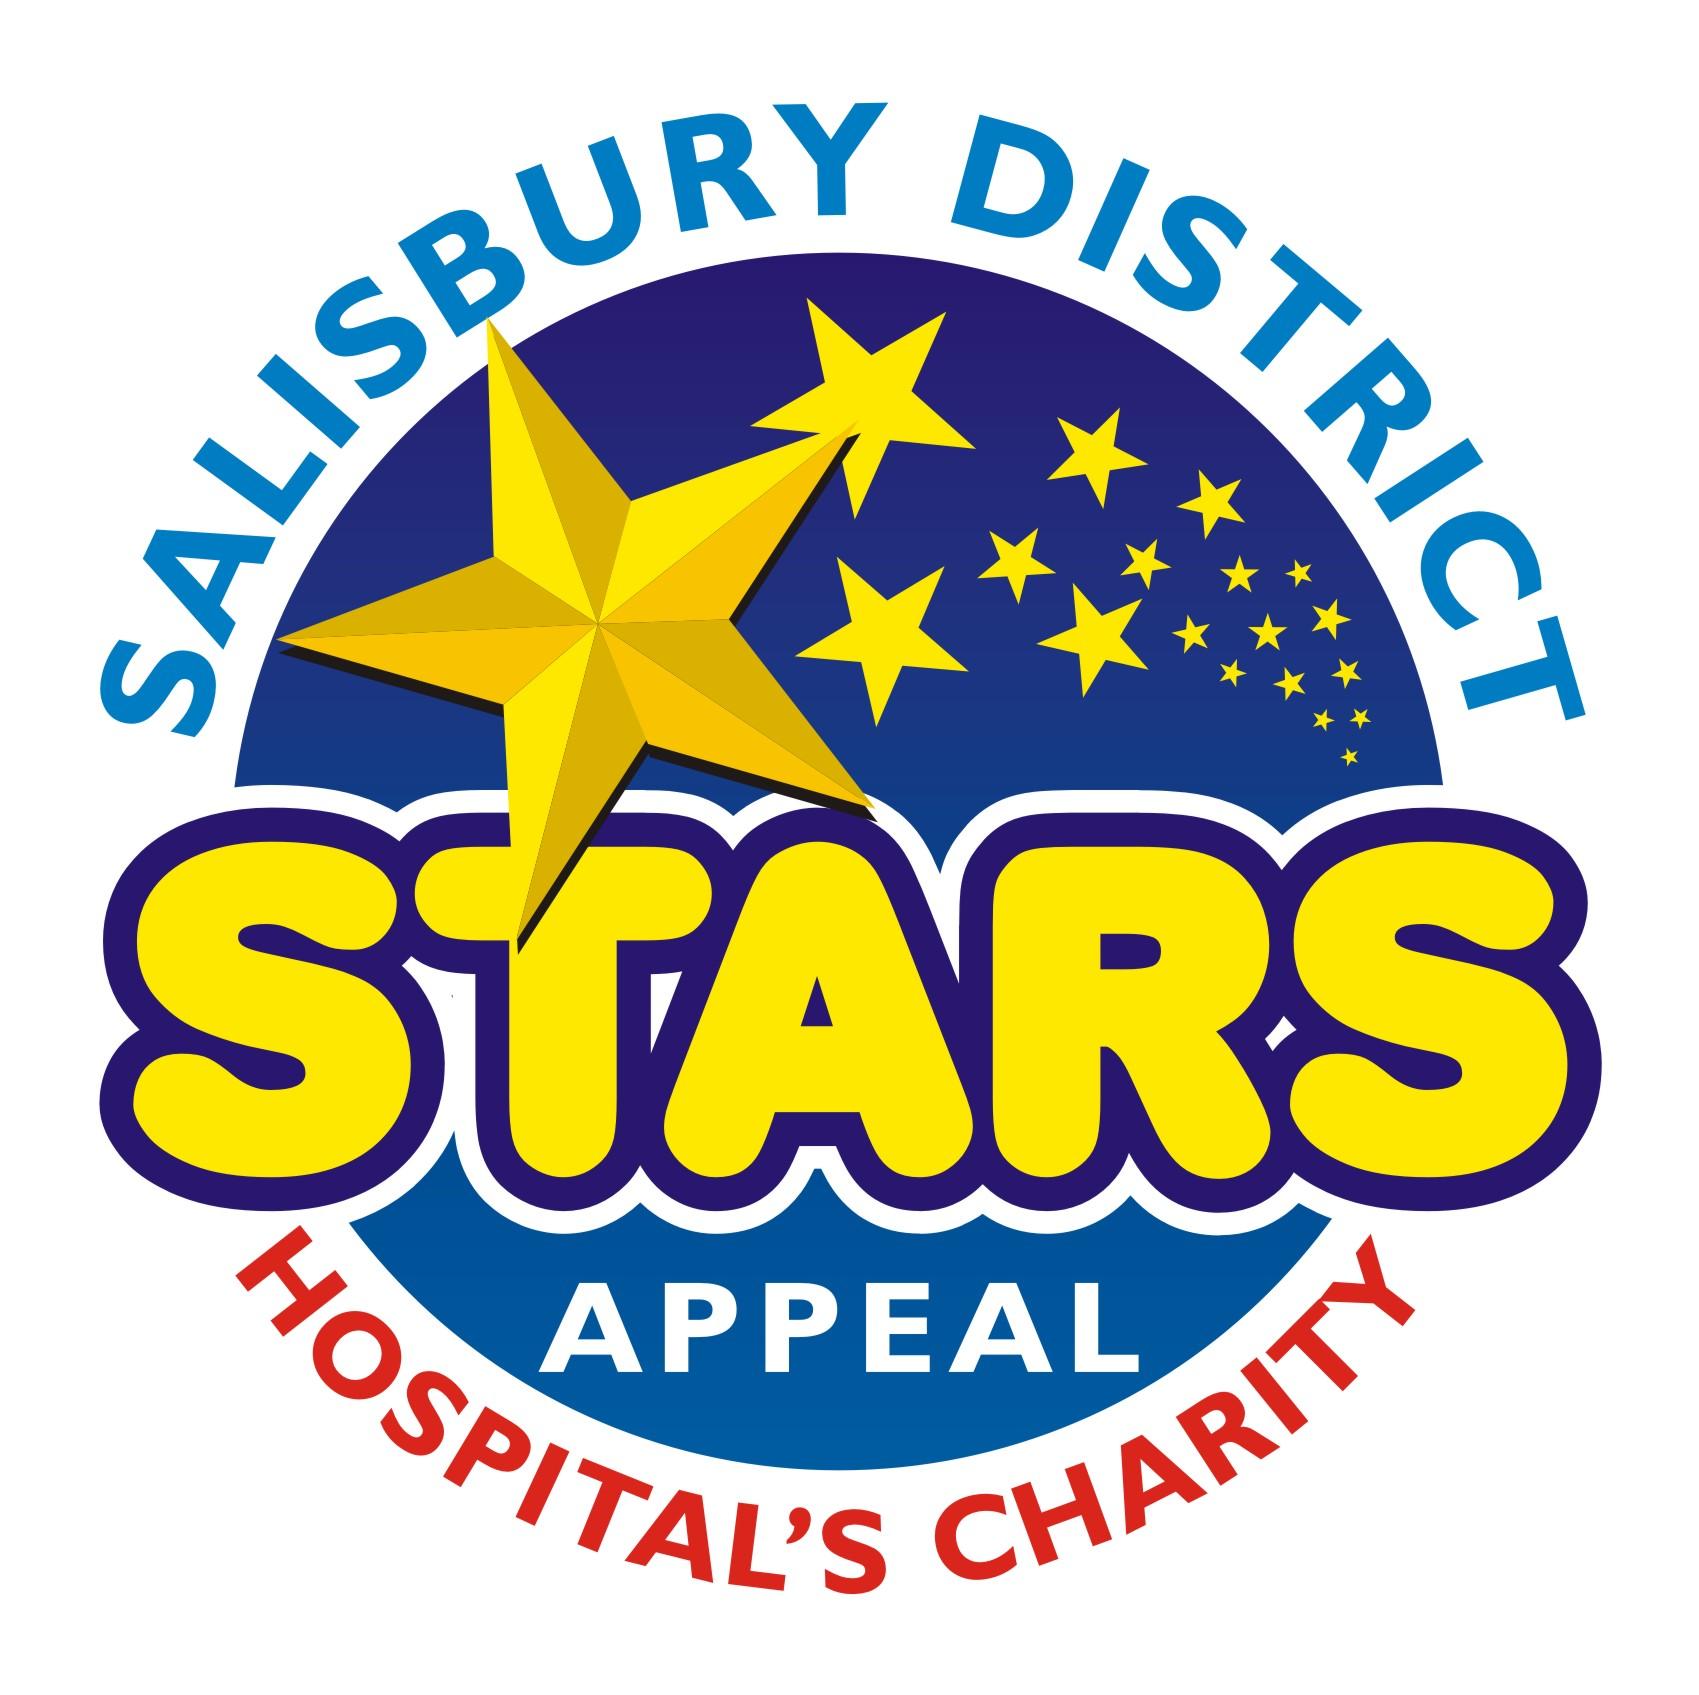 Salisbury NHS Stars Appeal Charity